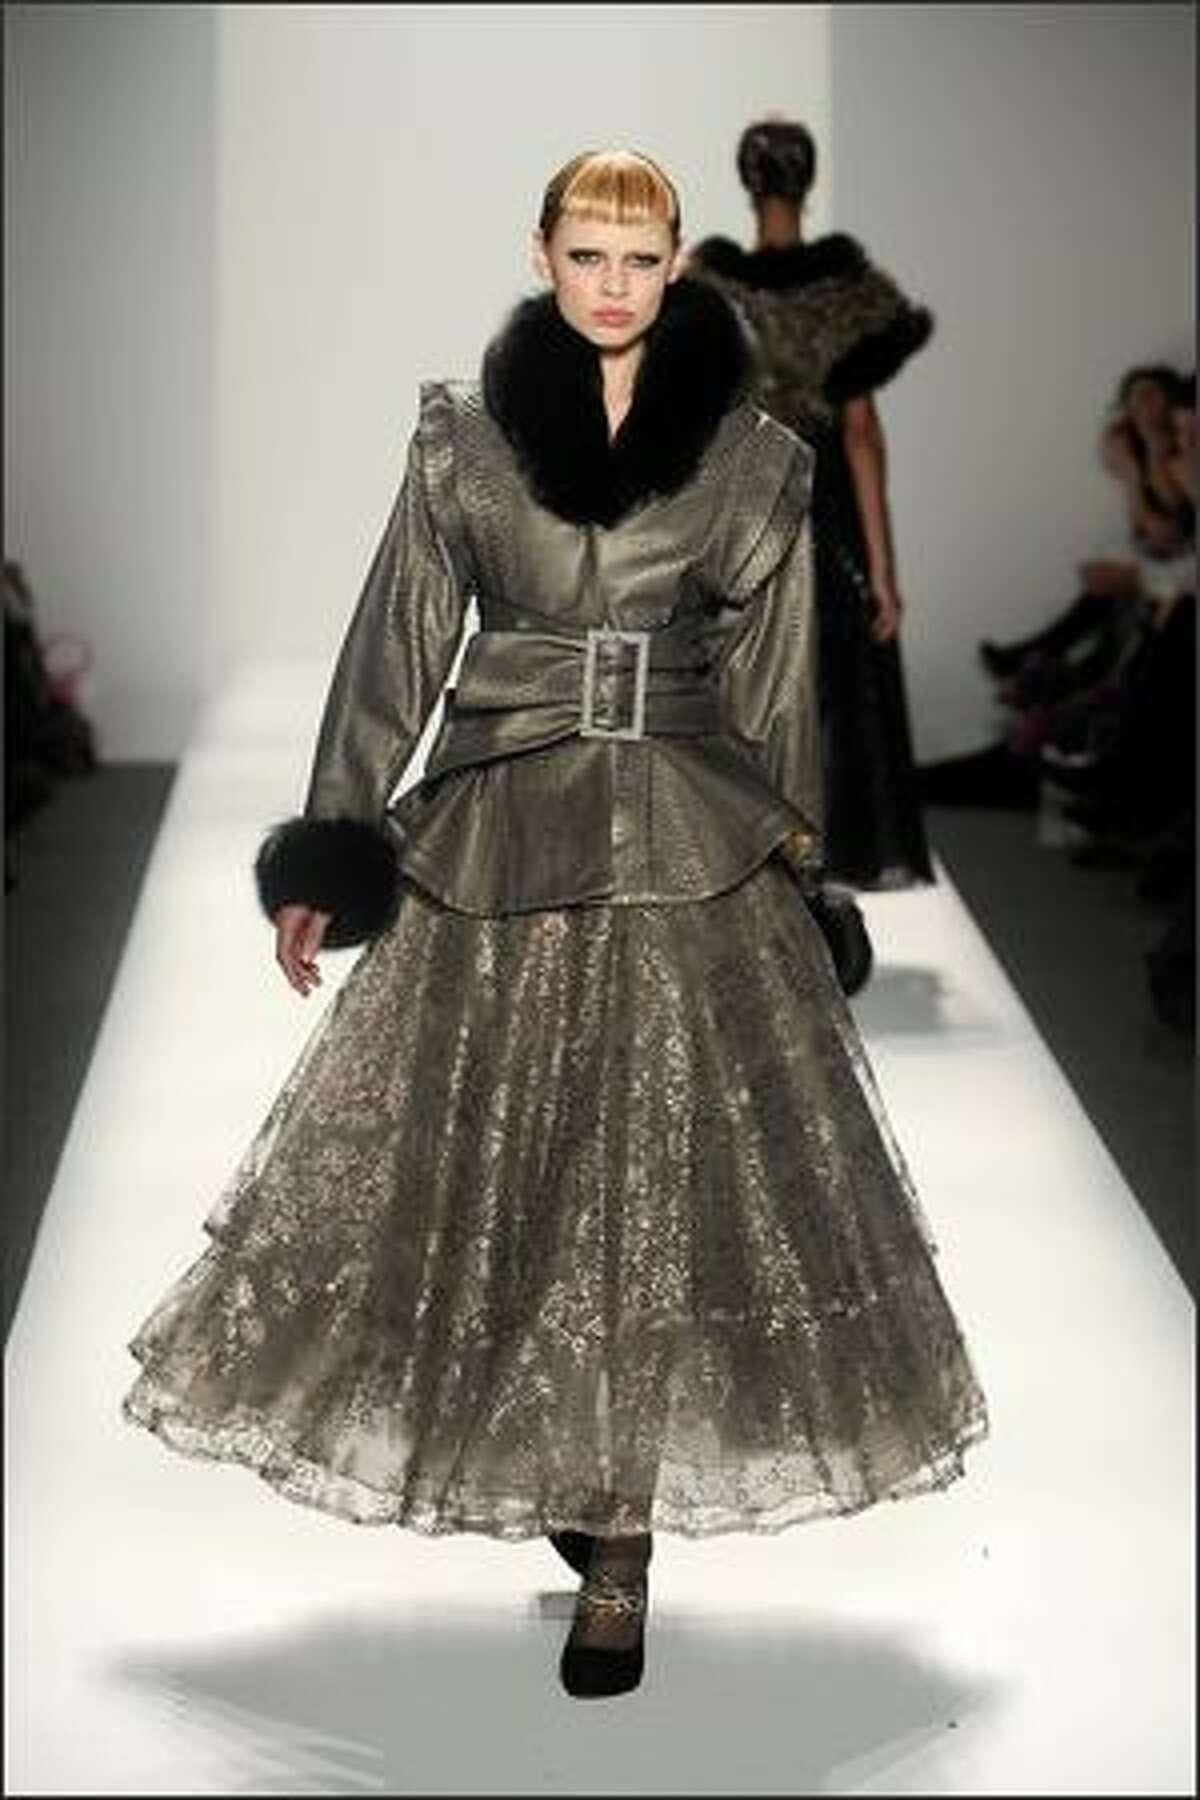 A model walks the runway at the Kati Stern/Venexiana fashion show.